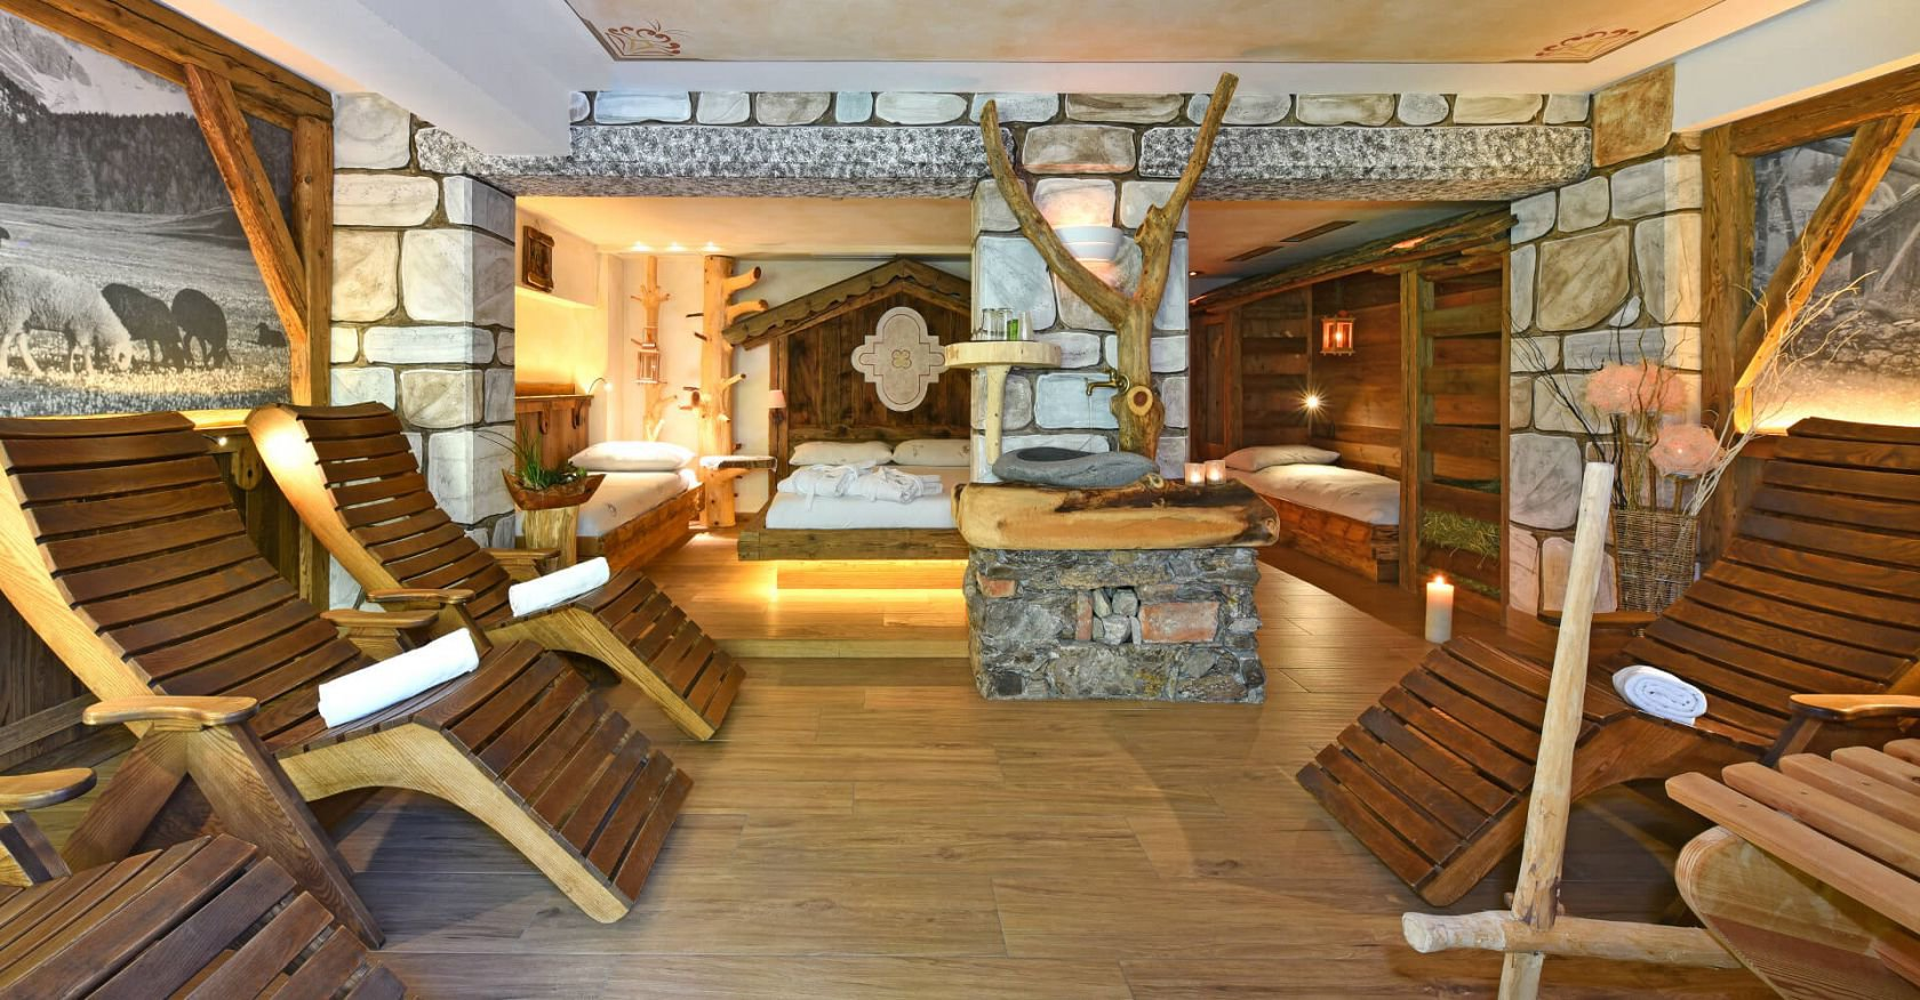 Wellnessurlaub im Berghotel Südtirol